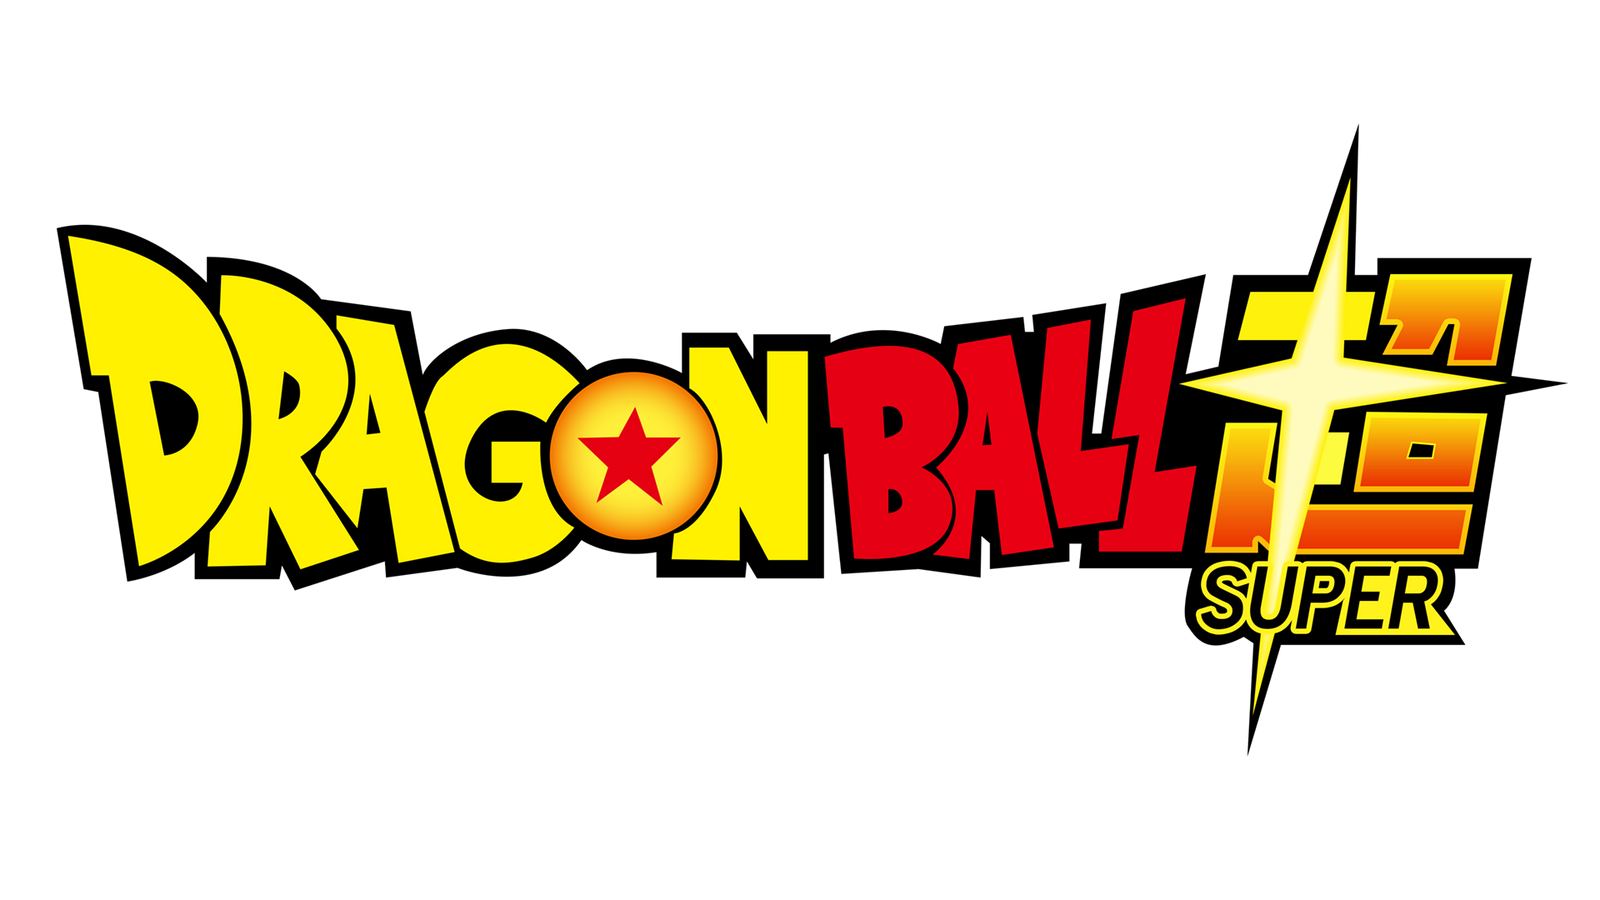 Dragon Ball Super Logo by Officiallec